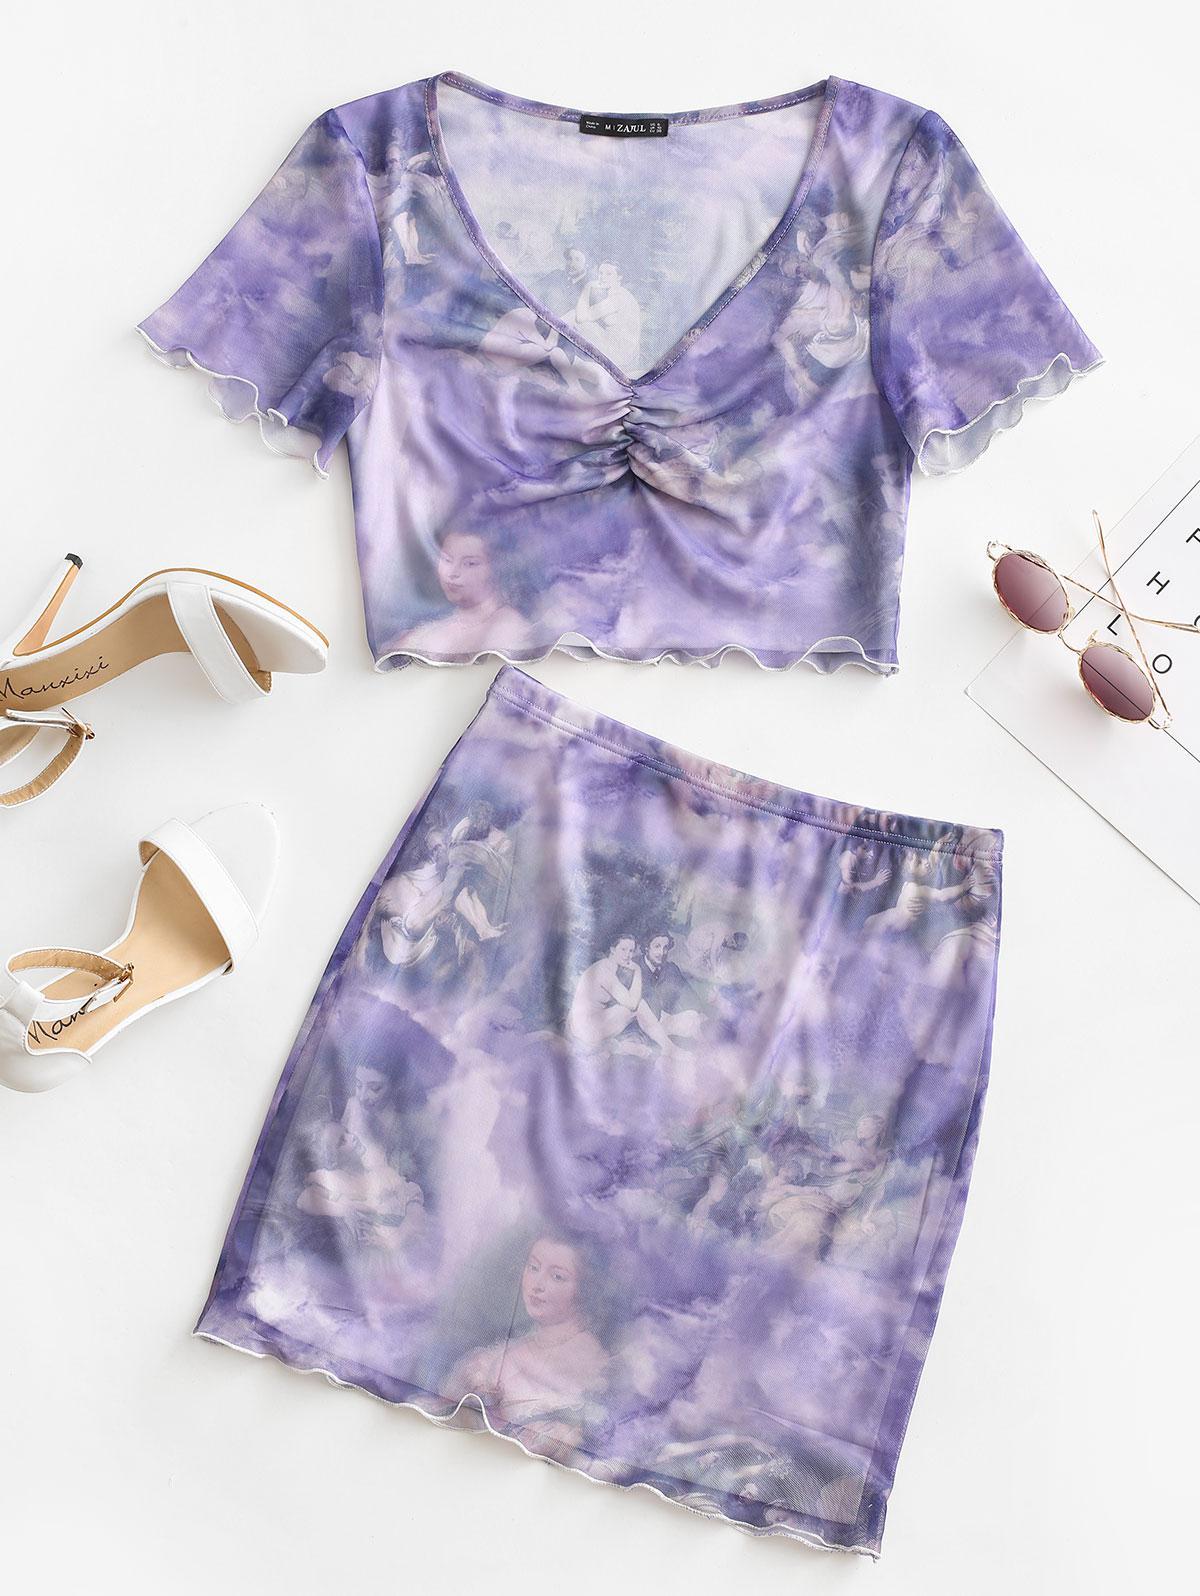 ZAFUL Mesh Ruched Renaissance Print Bodycon Skirt Set